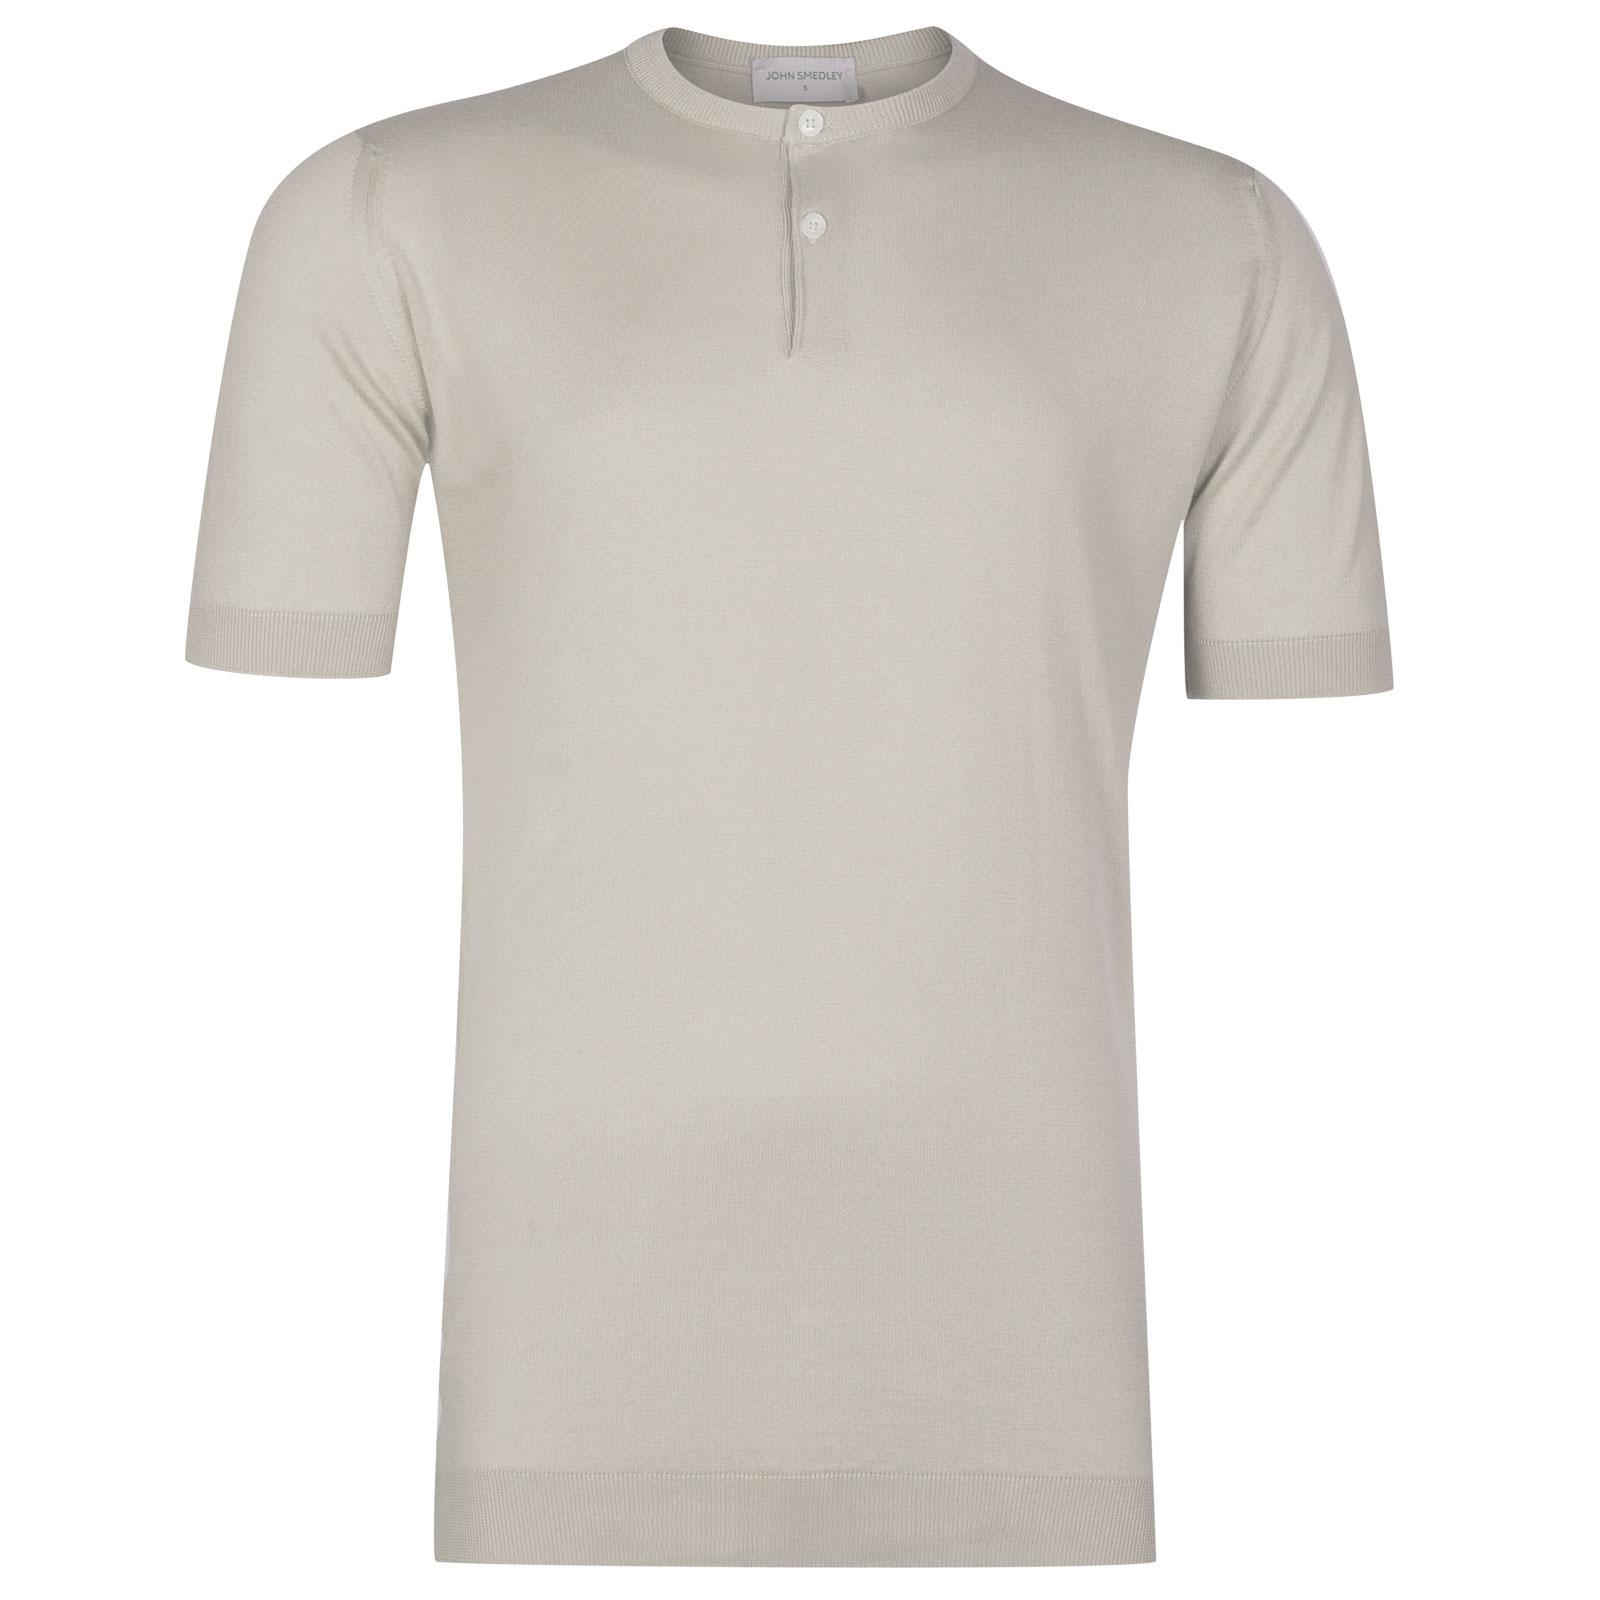 John Smedley Bennett in Brunel Beige T-Shirt-SML